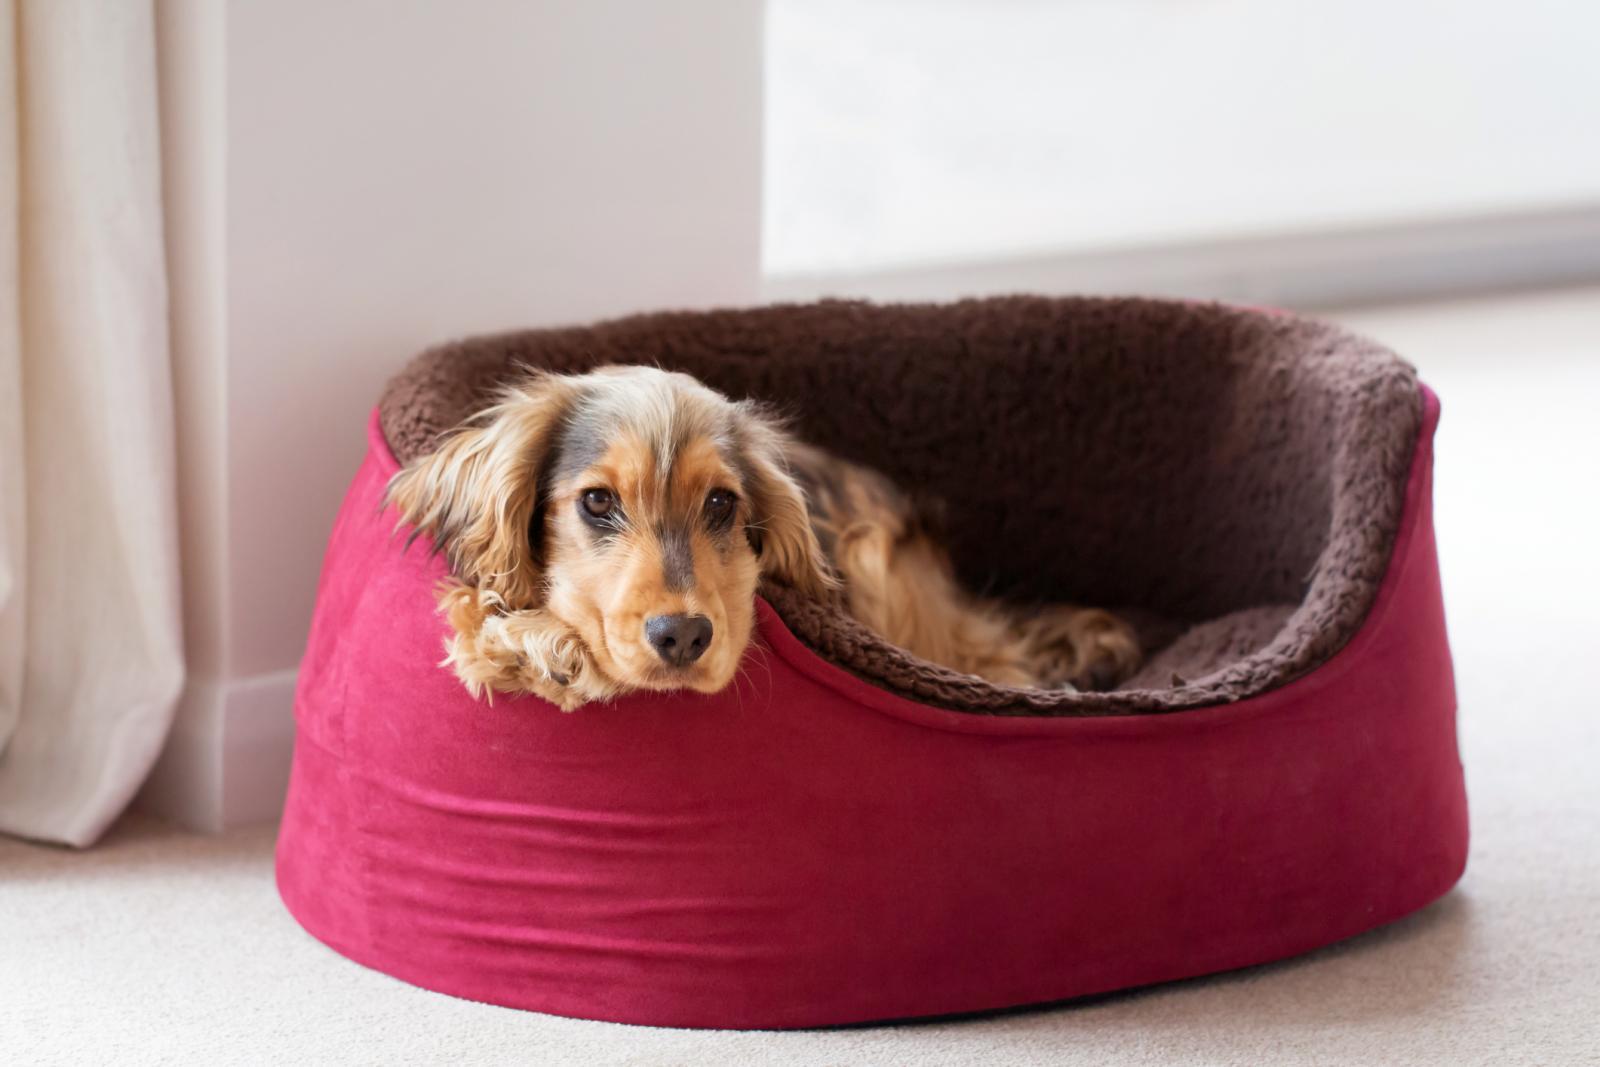 Pet Cat Dog Winter Cushion Beds Round Warm Mats Nests Ears Shape House Beds Cat Supplies